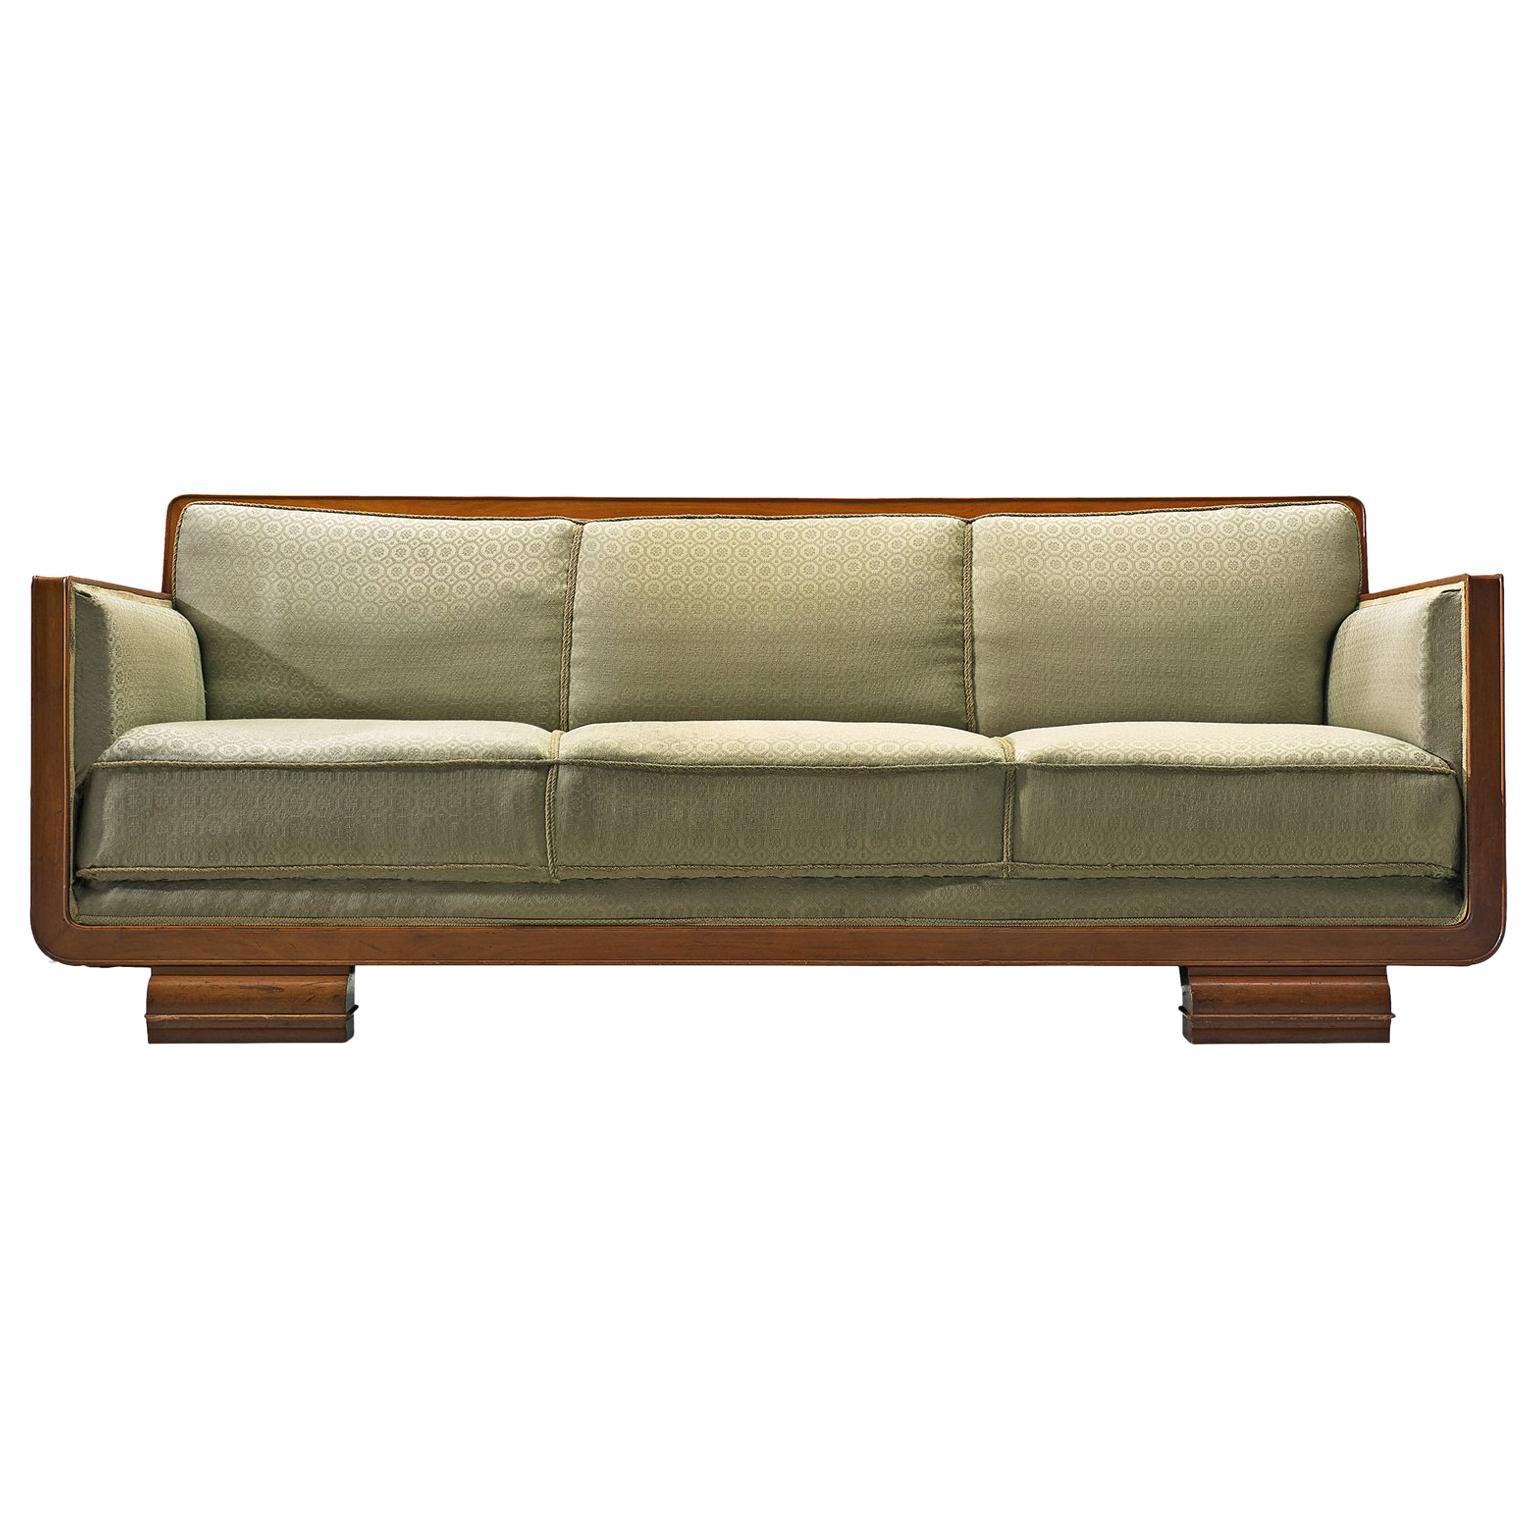 Superbe Art Deco Sofa, Green Fabric And Mahogany, France, 1940s